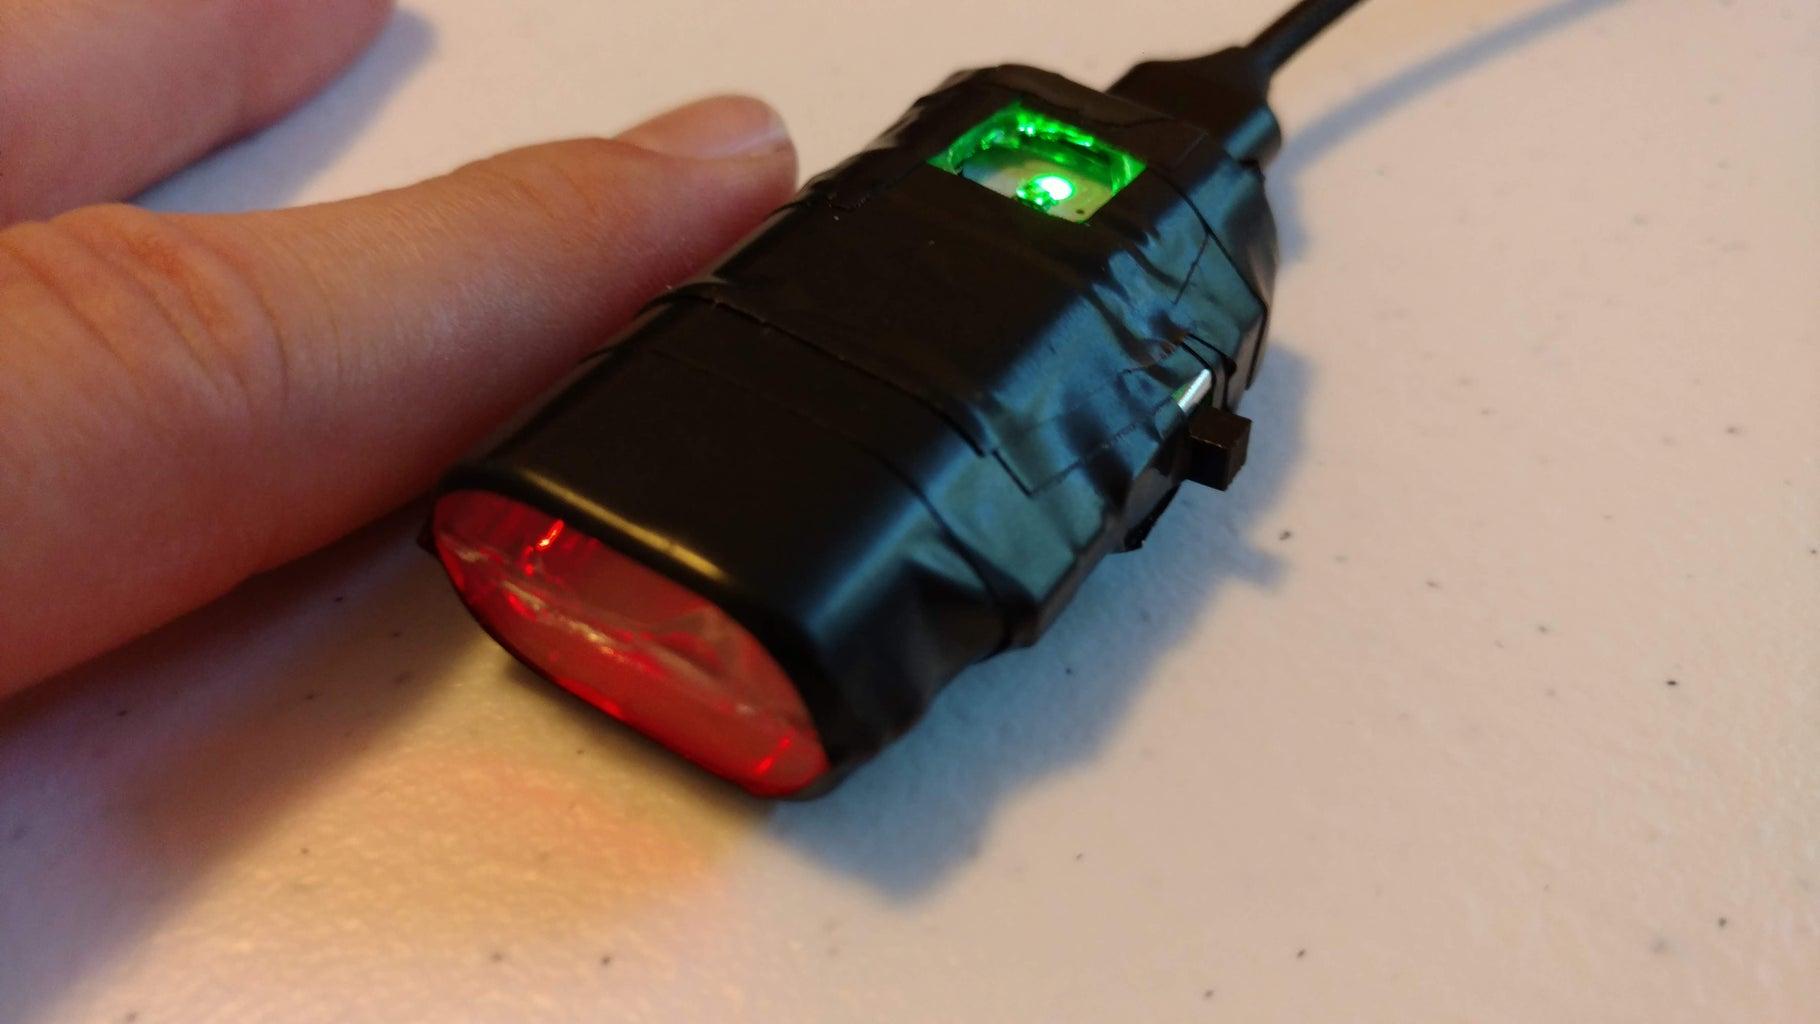 Bio-Adaptive Media Controller for Accessibility or Entertainment